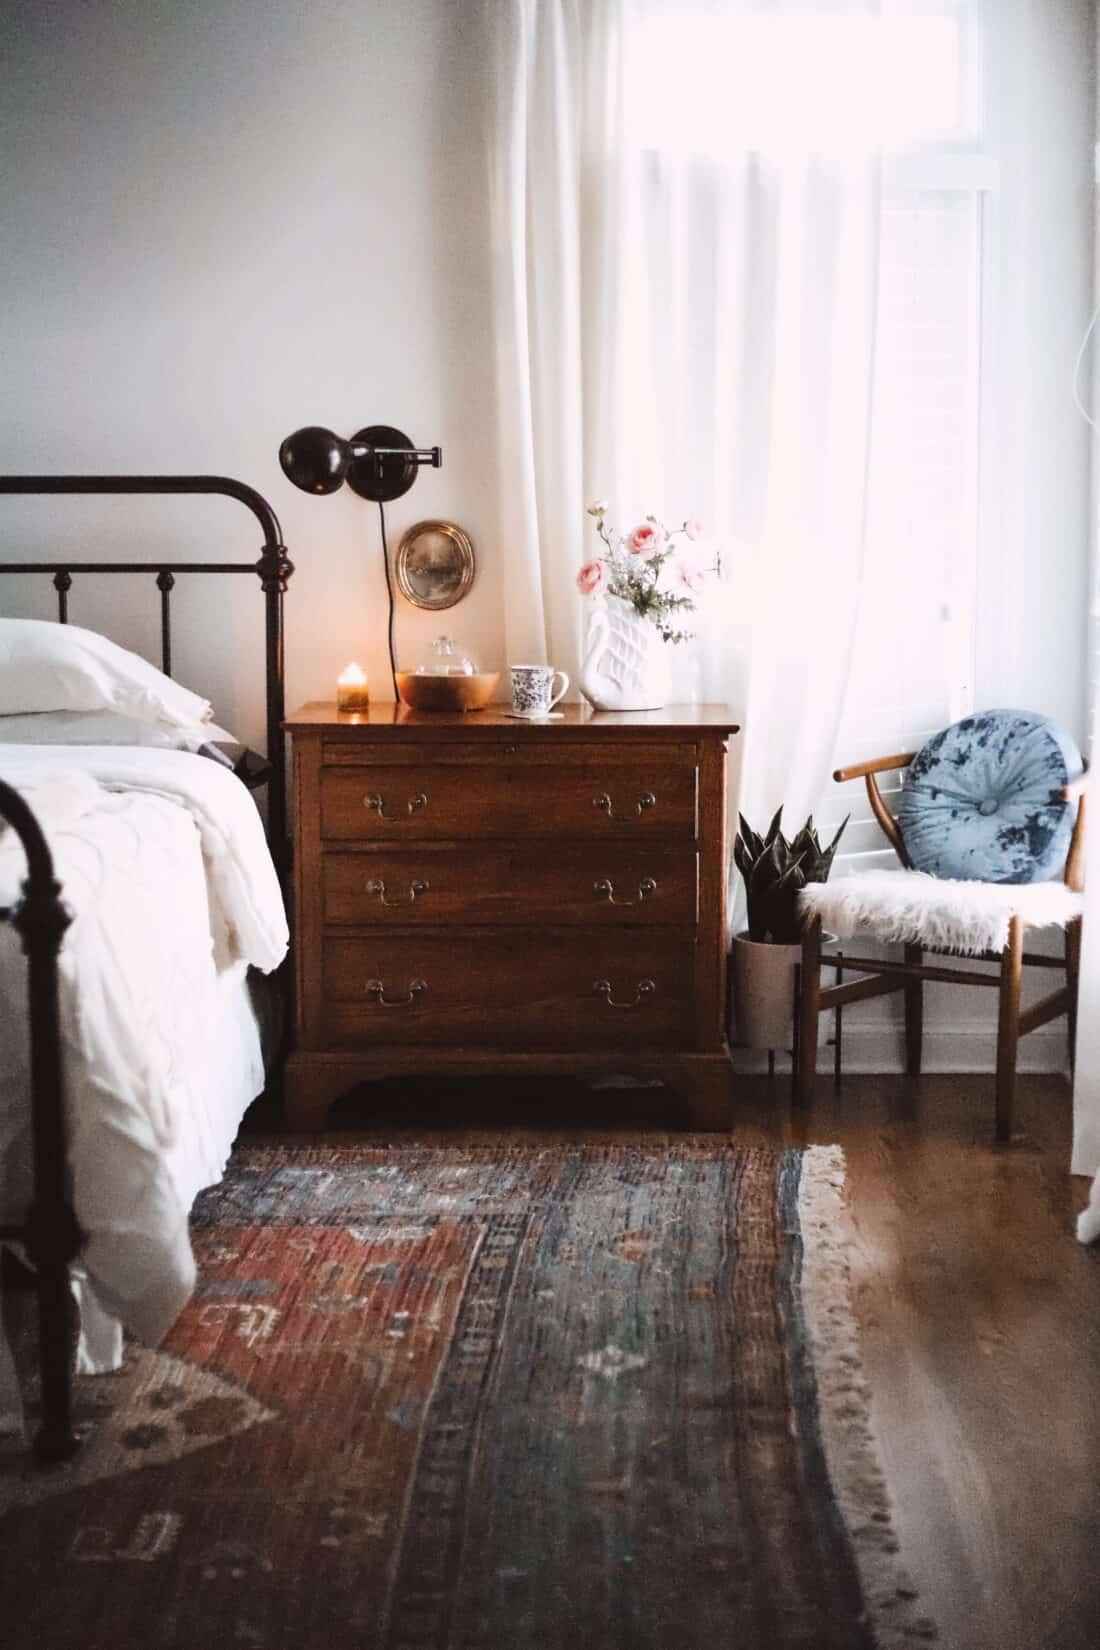 beeswax jar candle burning on a bedroom nightstand